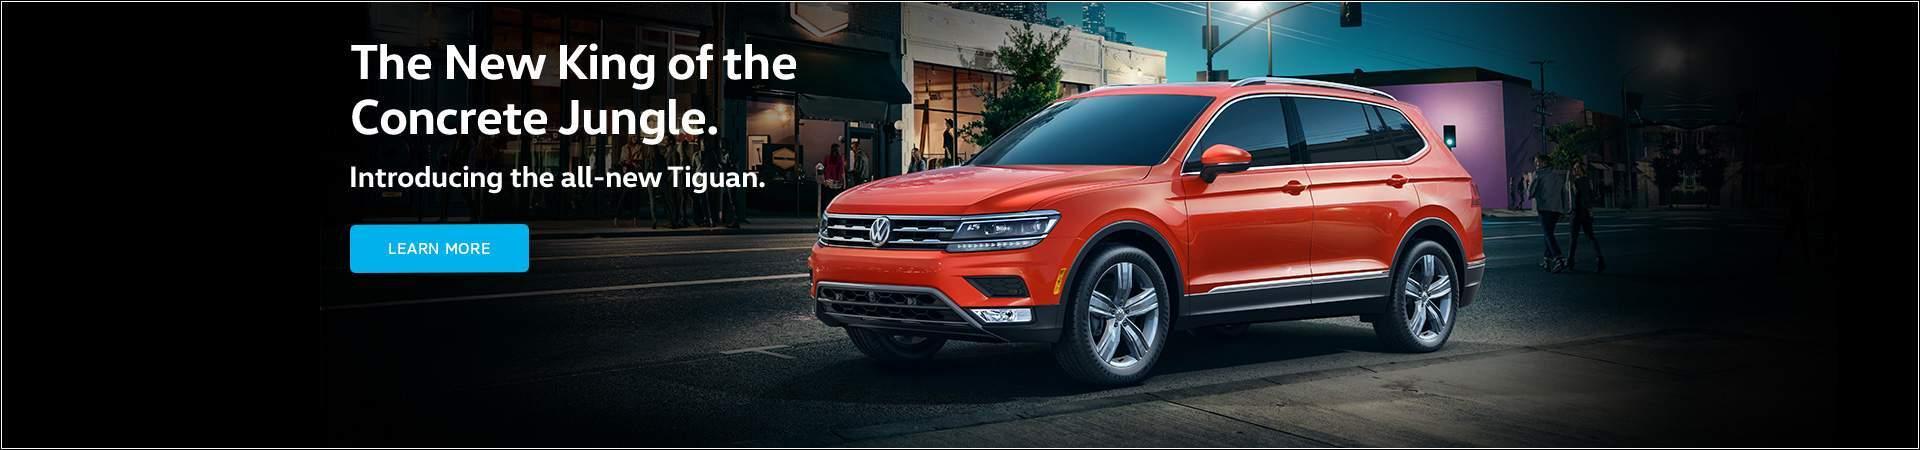 Volkswagen Dealership South Mississippi Ms Used Cars